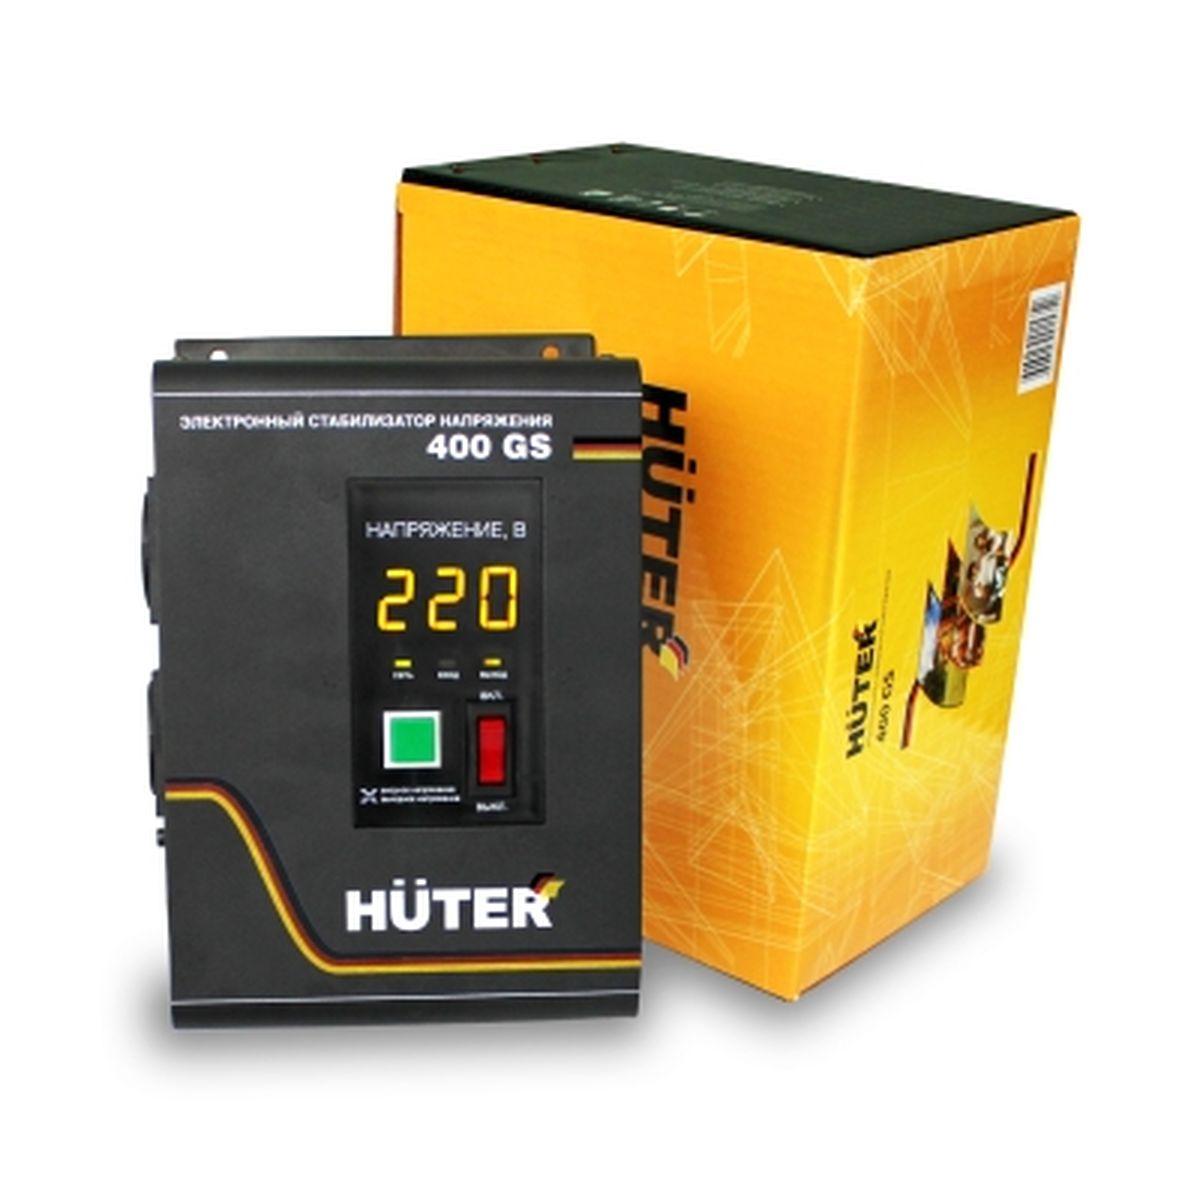 все цены на Стабилизатор напряжения Huter 400GS онлайн